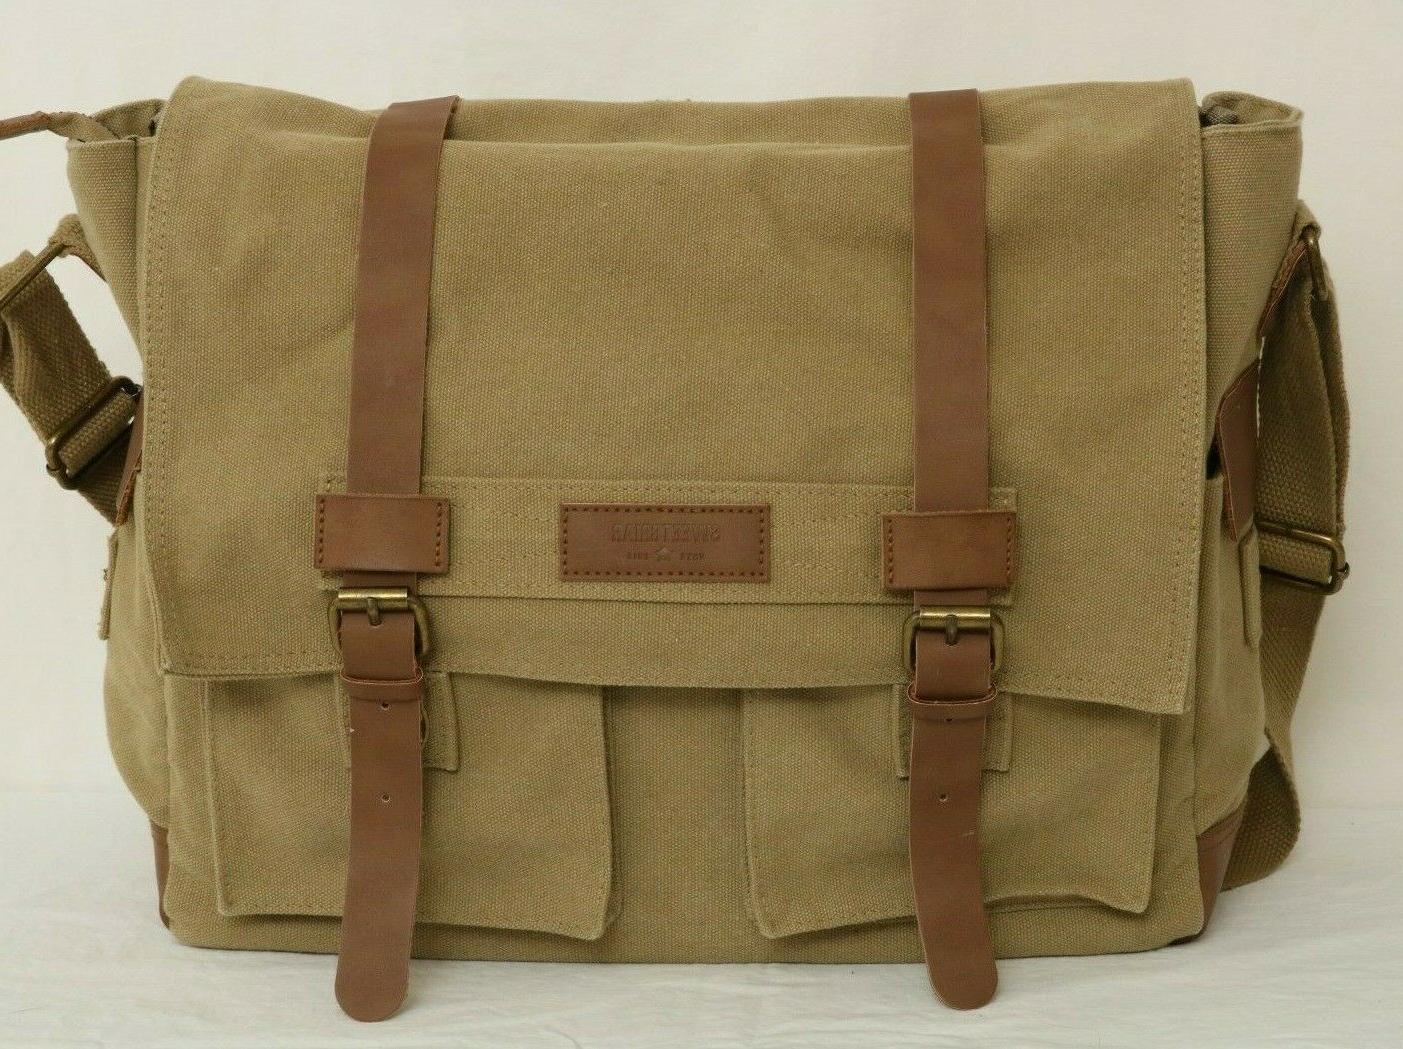 Sweetbriar Canvas Laptop Briefcase Business Casual Shoulder Messenger Bag